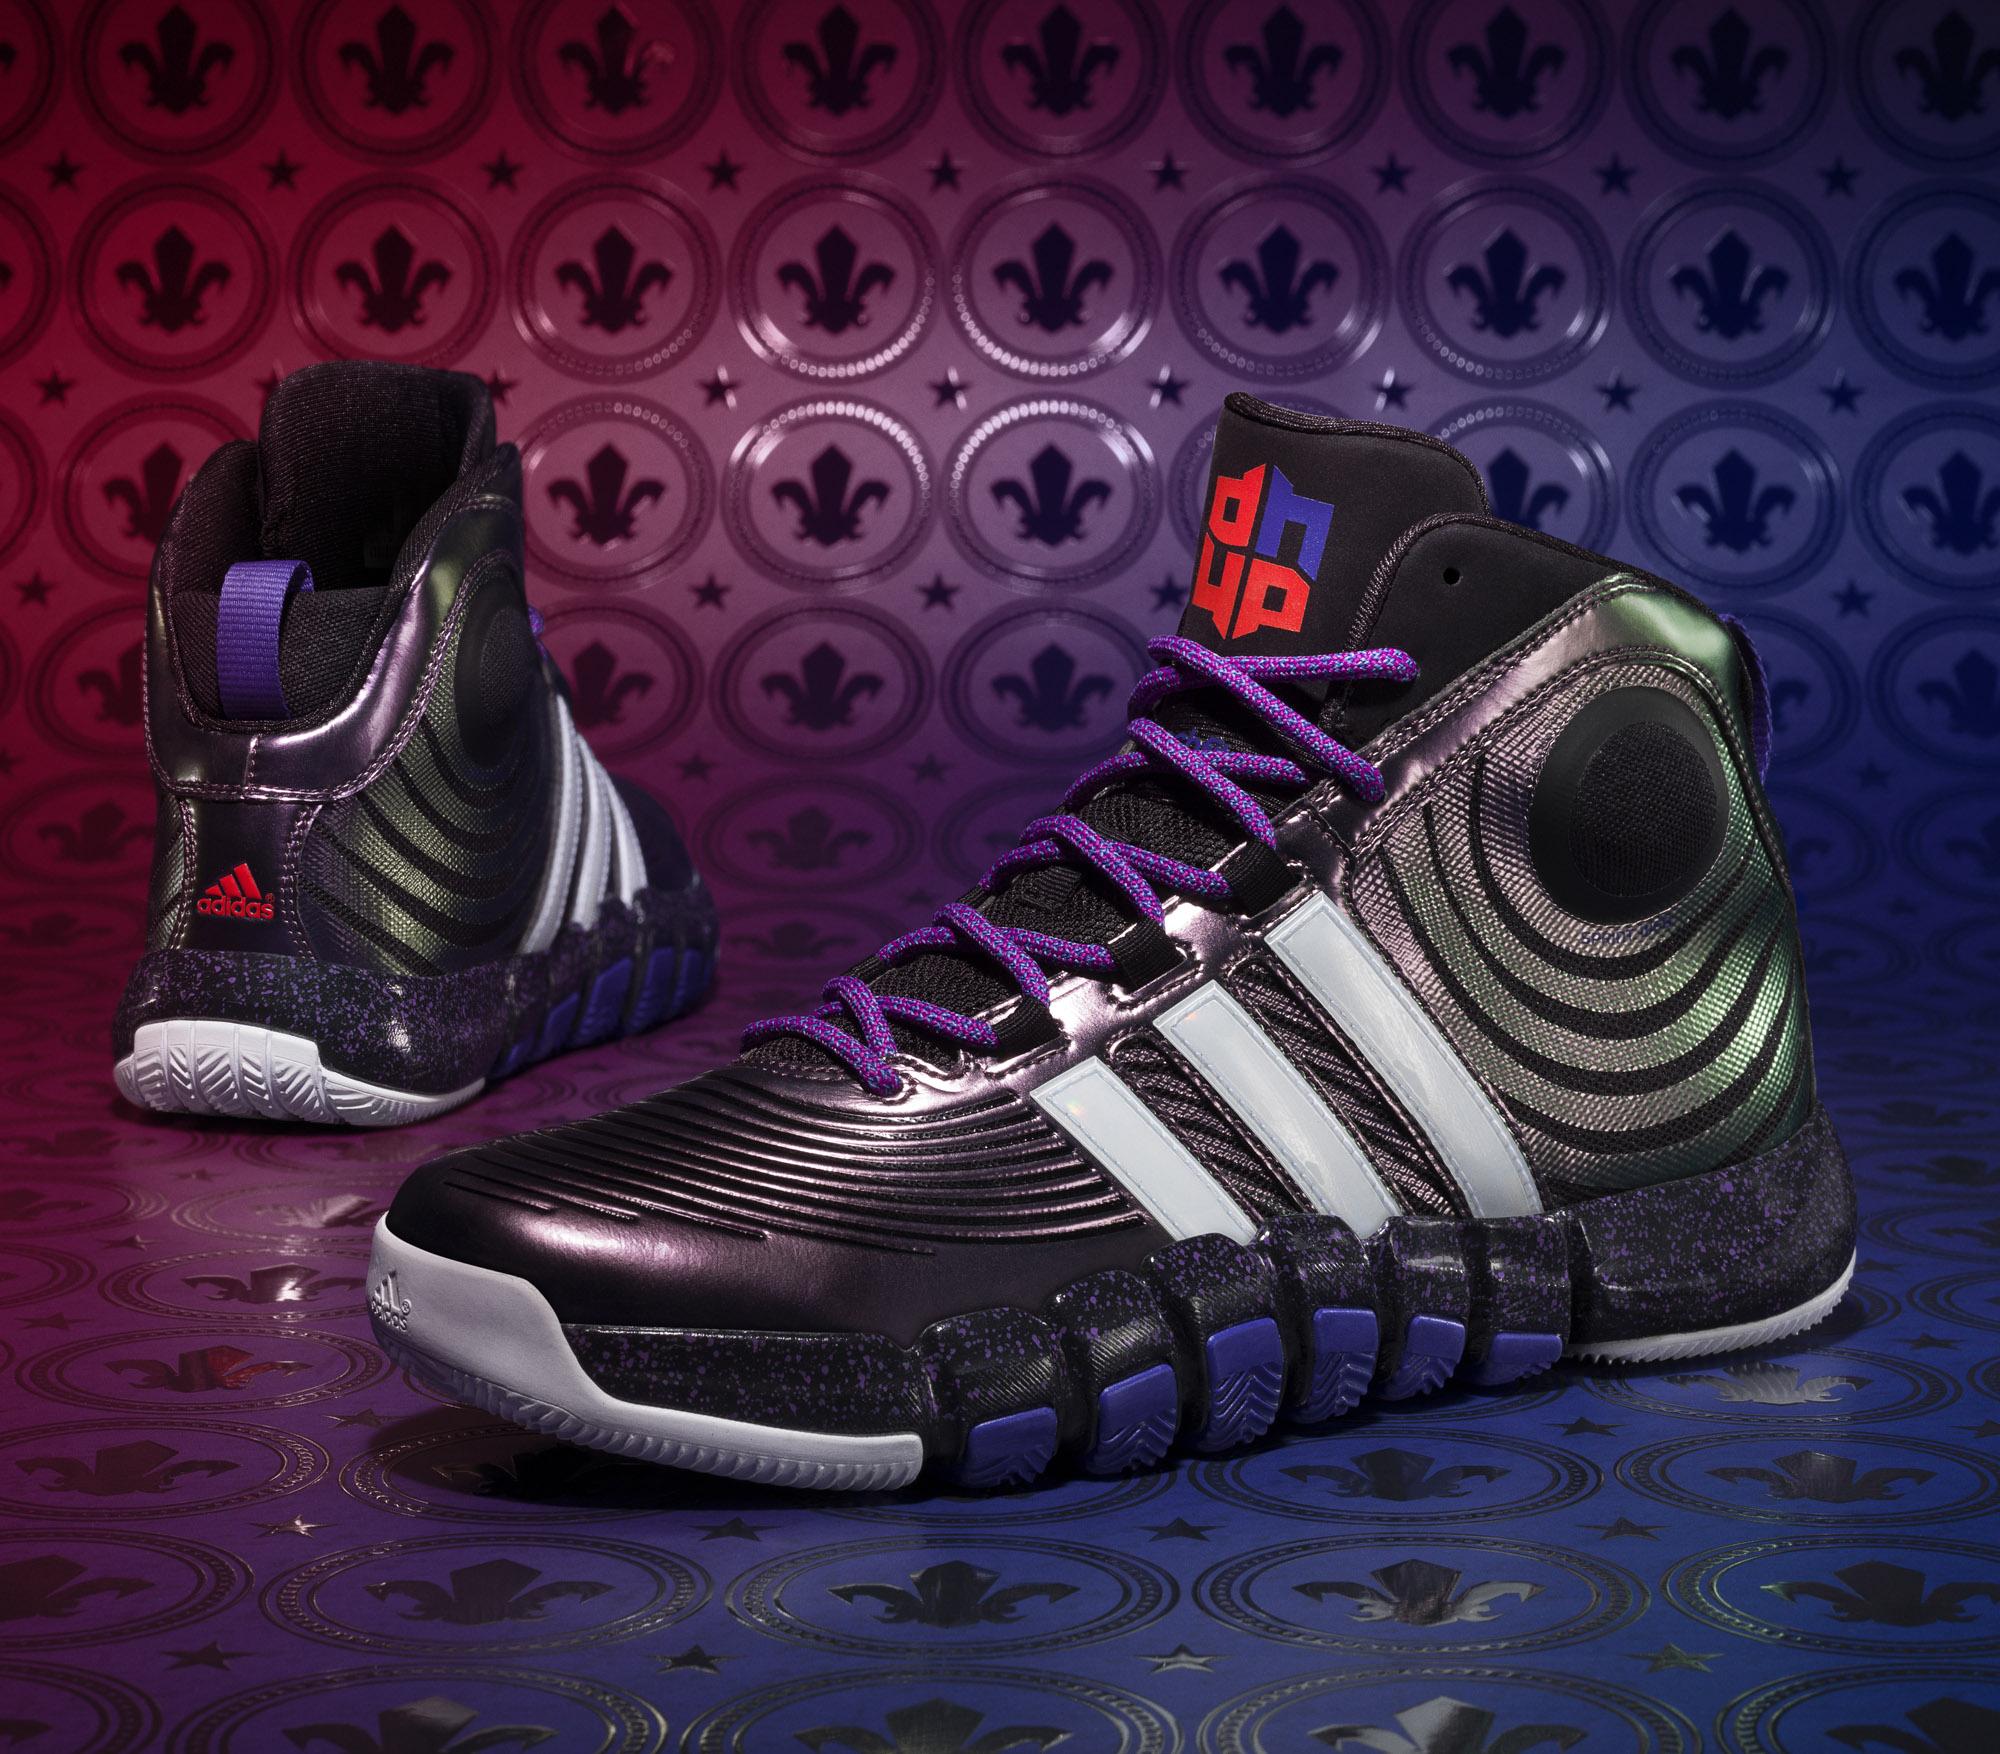 604678265e67ed BMF Debut  The adidas 2014 NBA All-Star Collection - Hardwood and ...